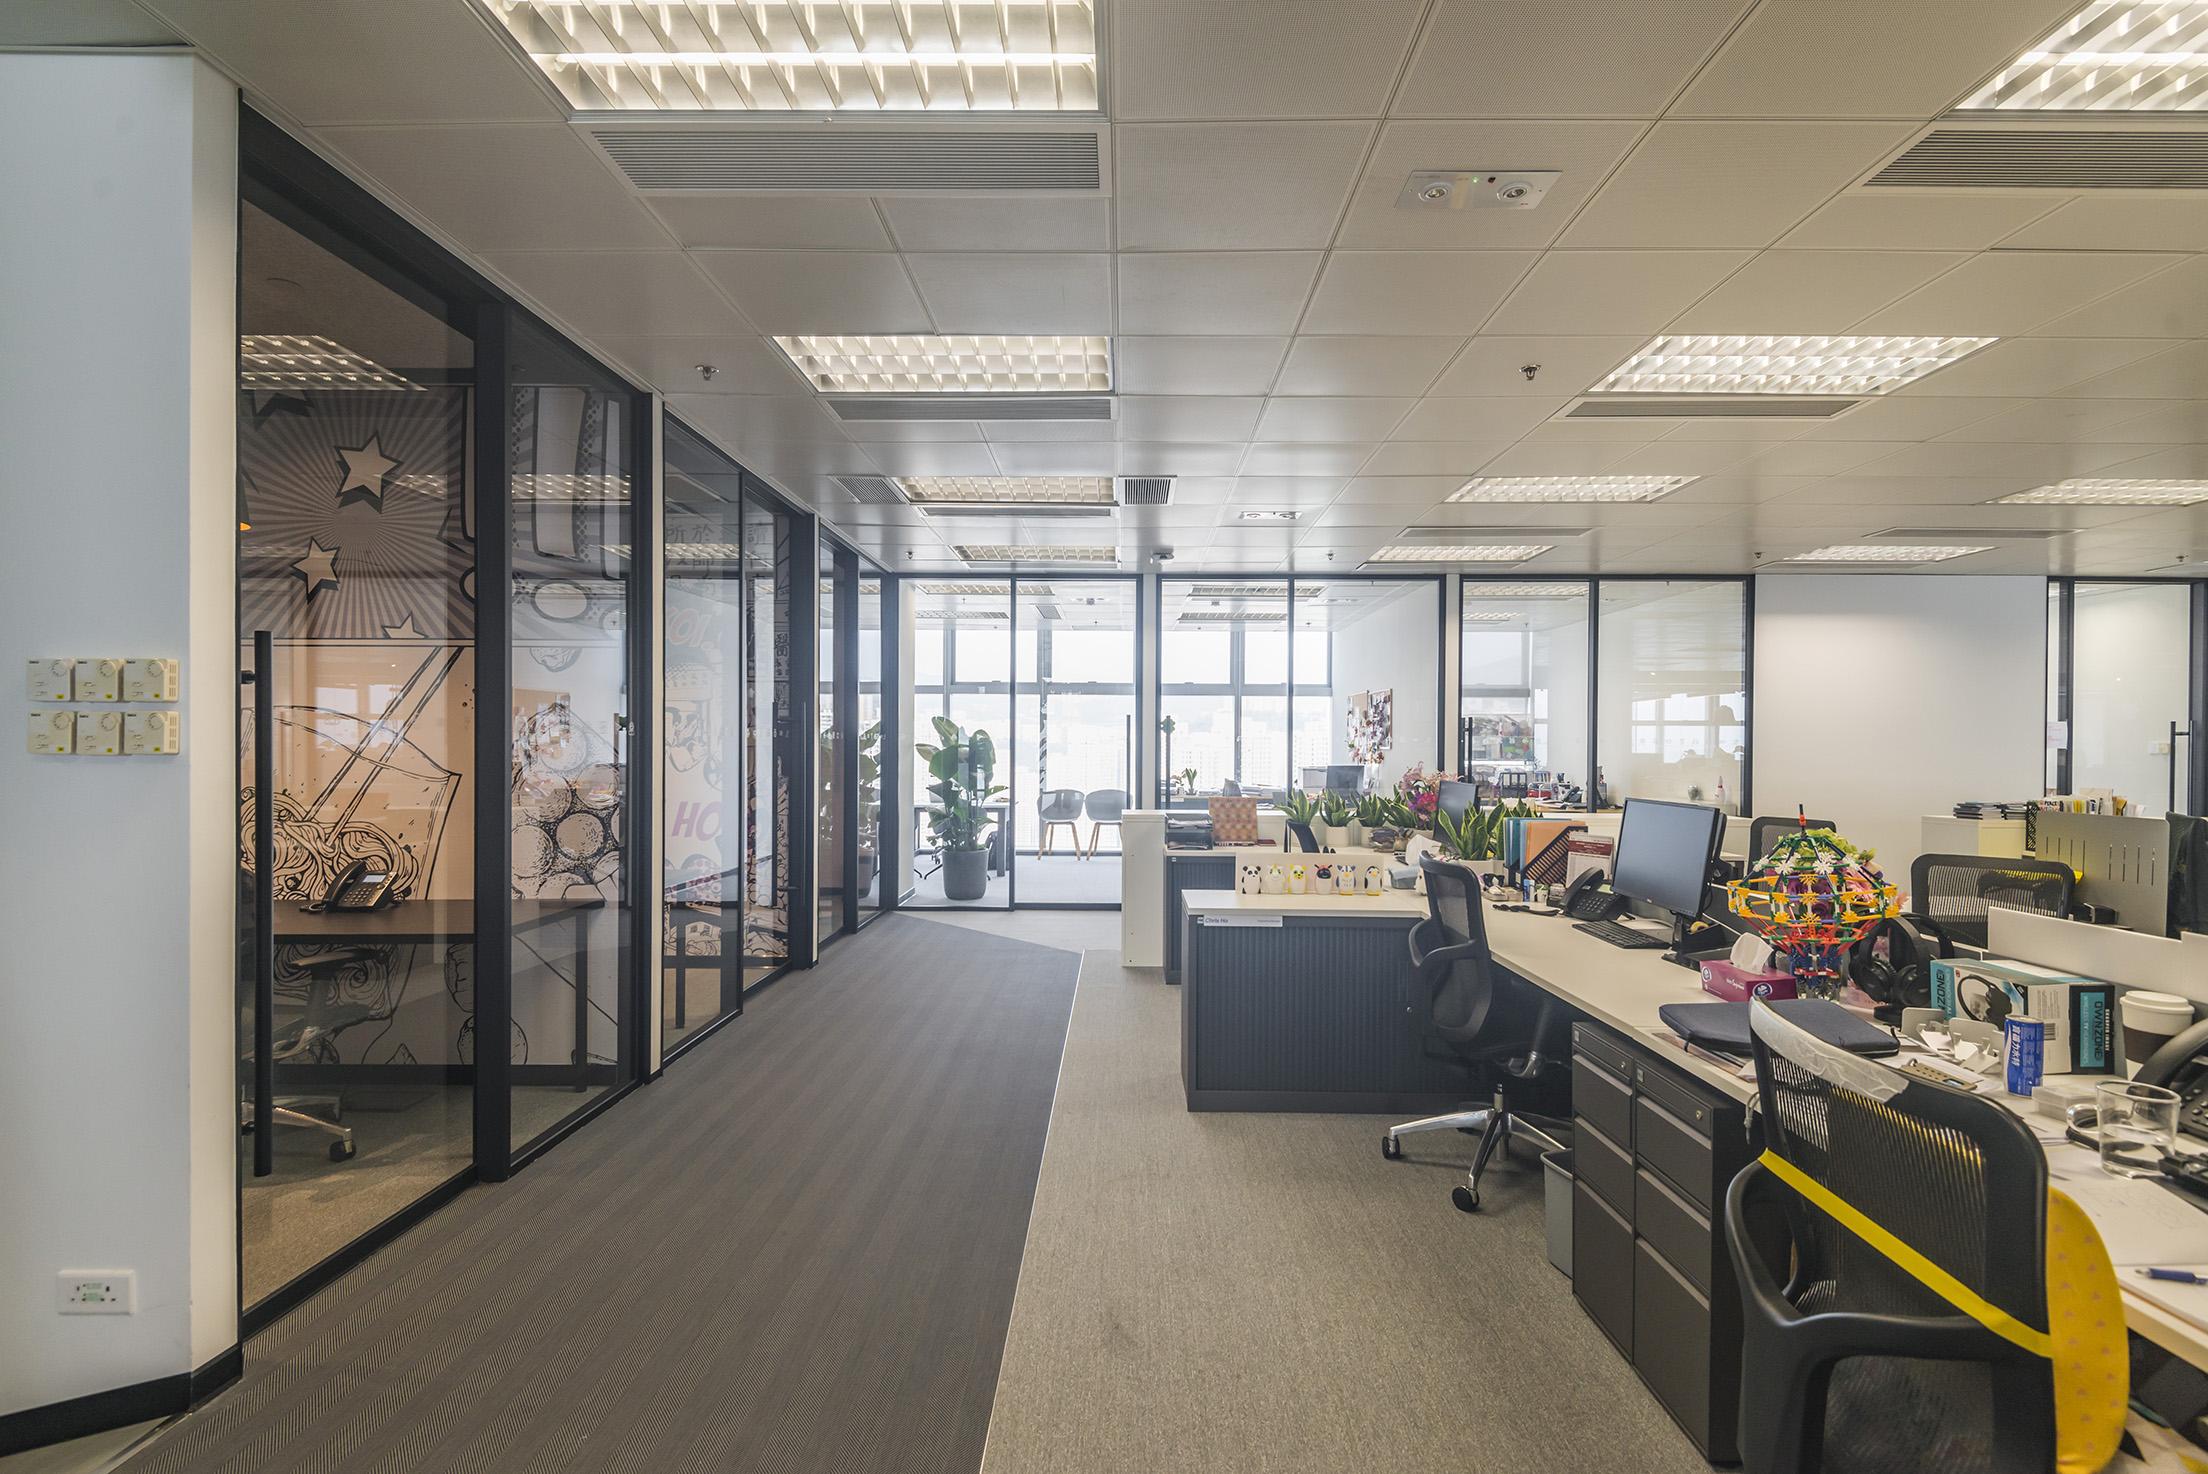 jeb-partitions-summit-threesixty-office-hk-10.jpg